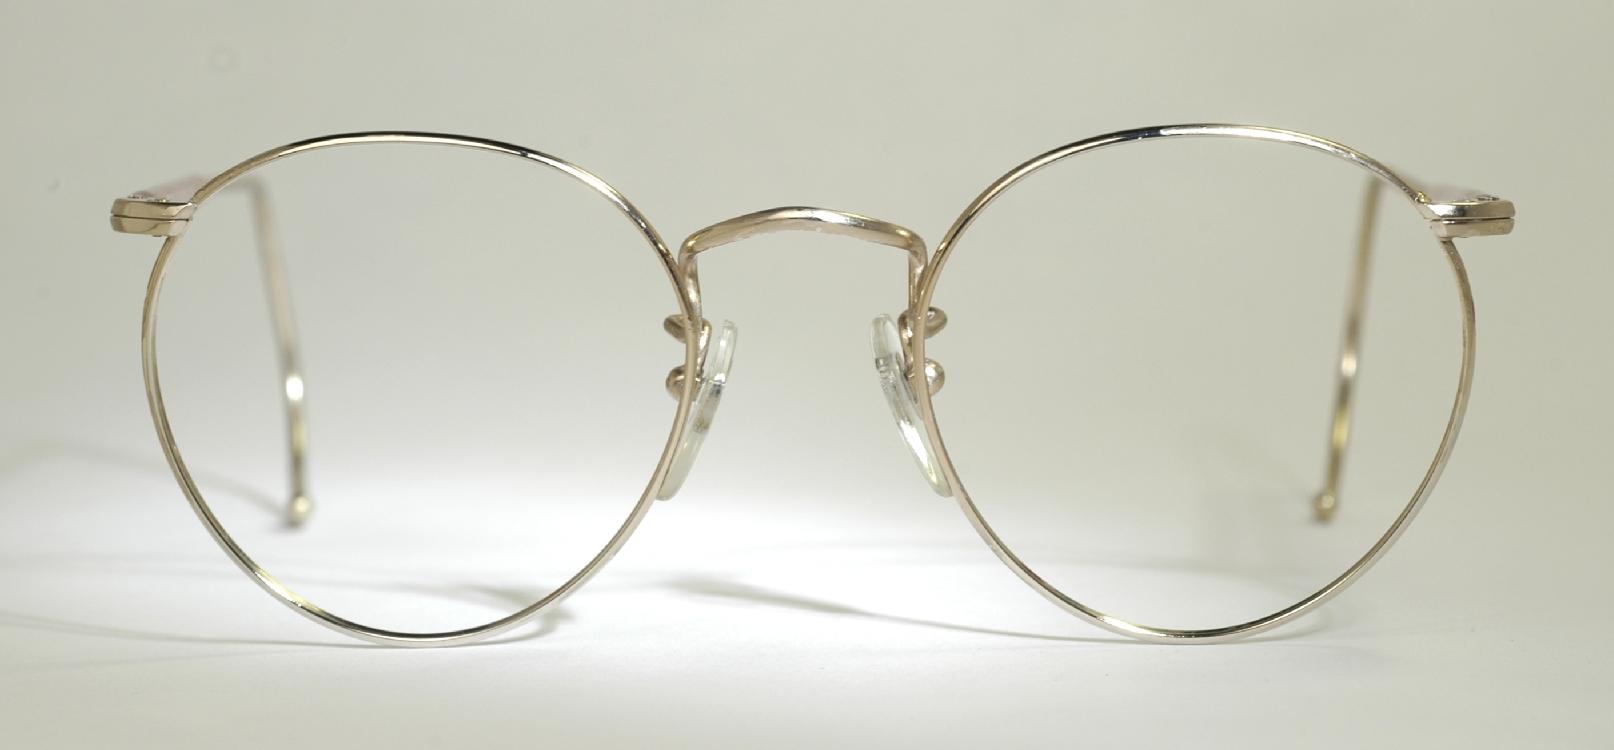 Optometrist Attic - GOLD WIRE RIM VINTAGE EYEGLASSES